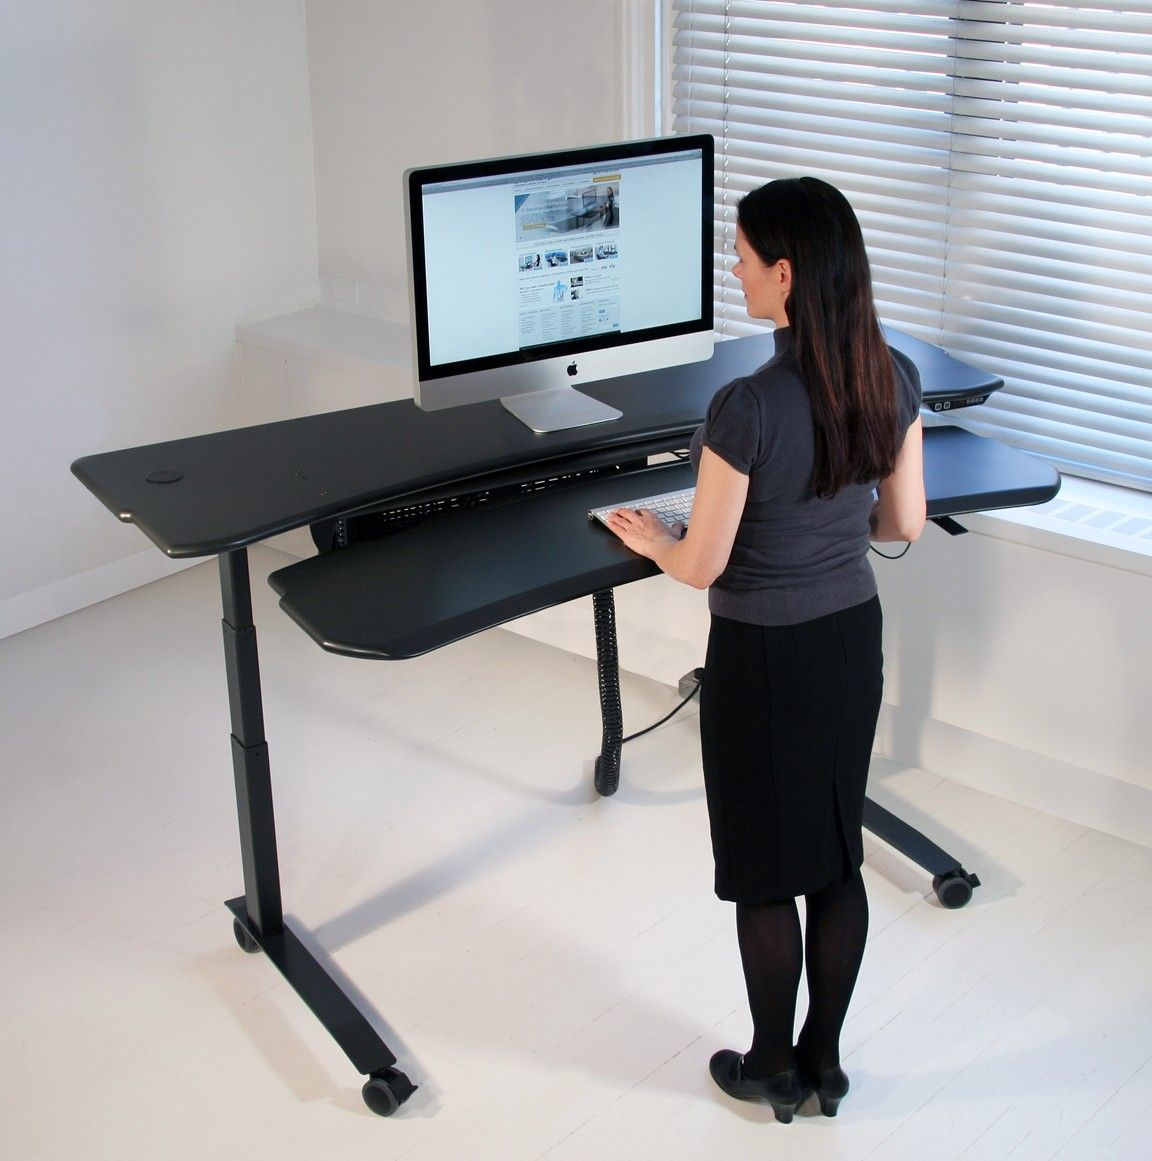 Http Www Biomorphdesk Com Products Ergonomic Adjustable Desks Flexo Desk Series Flexo Level3 Standing Desk Attachment Standing Desk Motorized Standing Desk